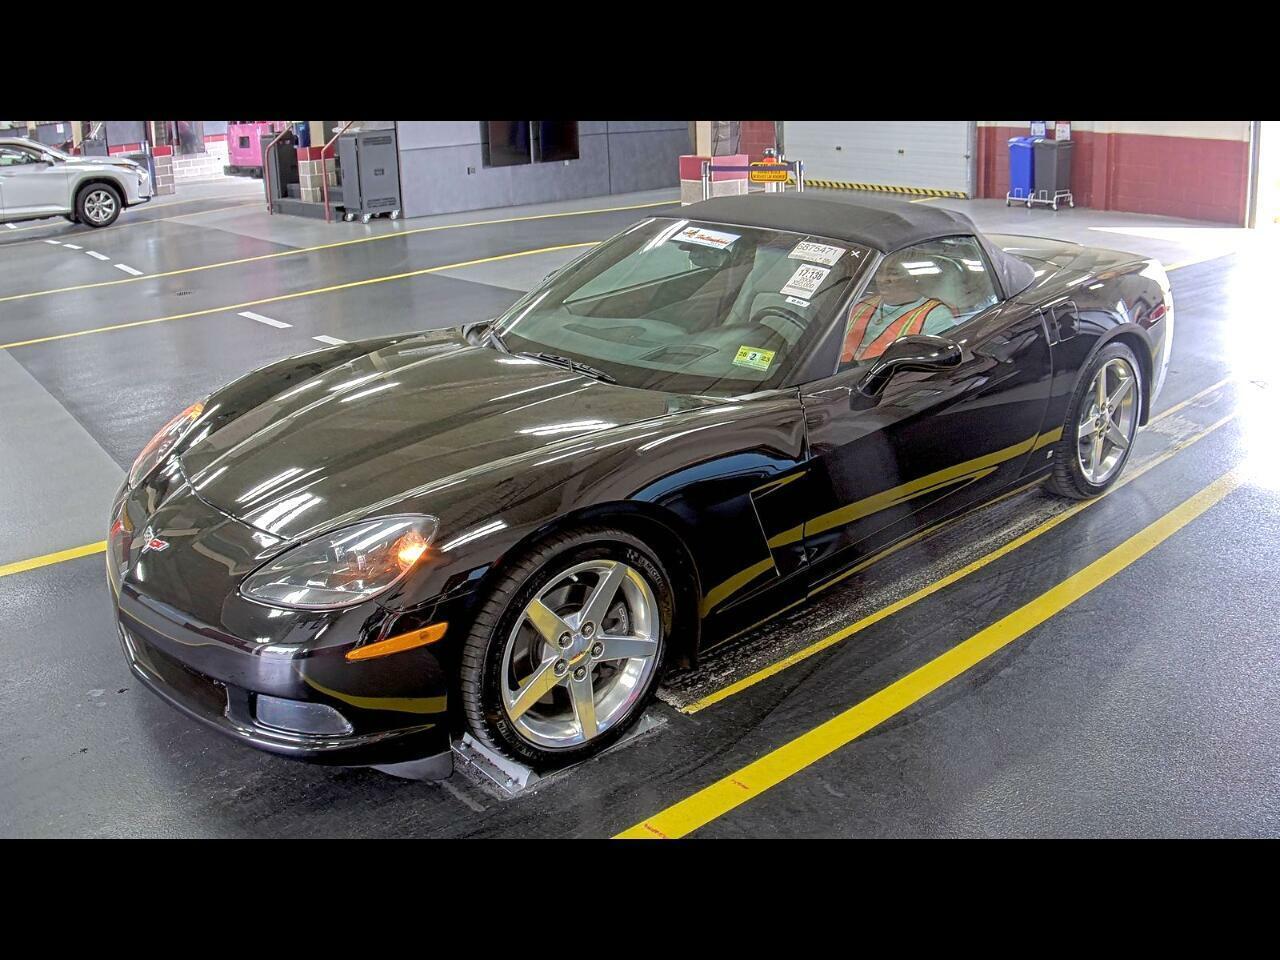 2006 Black Chevrolet Corvette Convertible  | C6 Corvette Photo 1